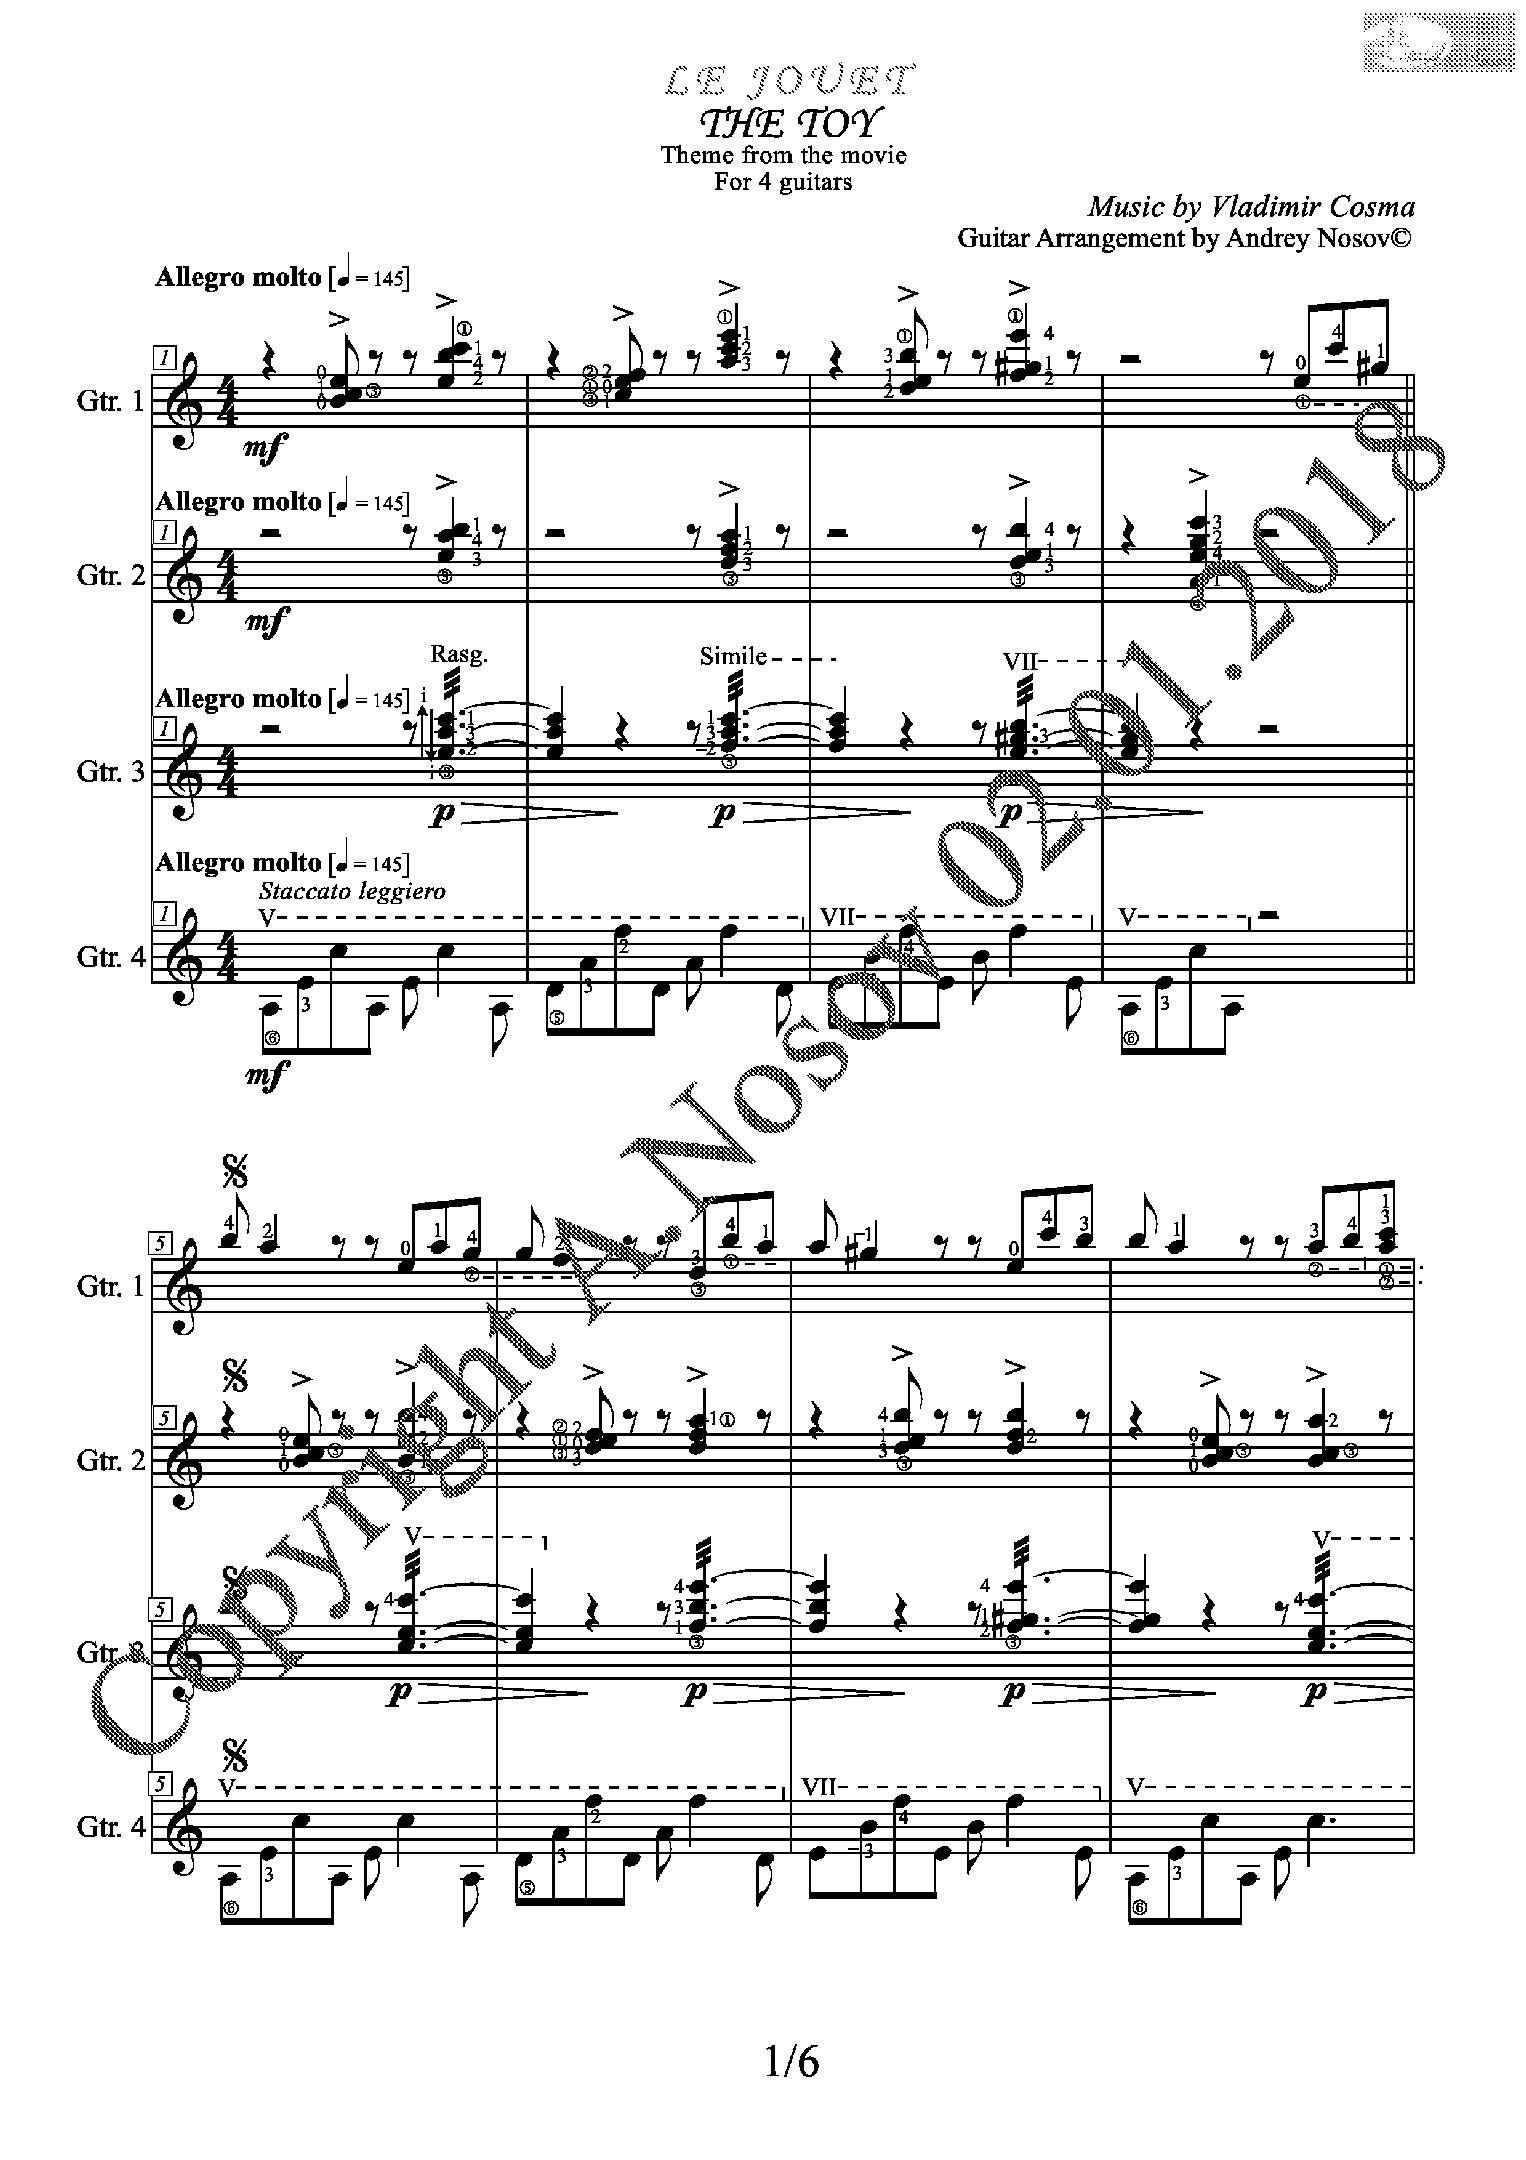 Le Jouet (V.Cosma) Sheet Music for a 4-guitar ensemble